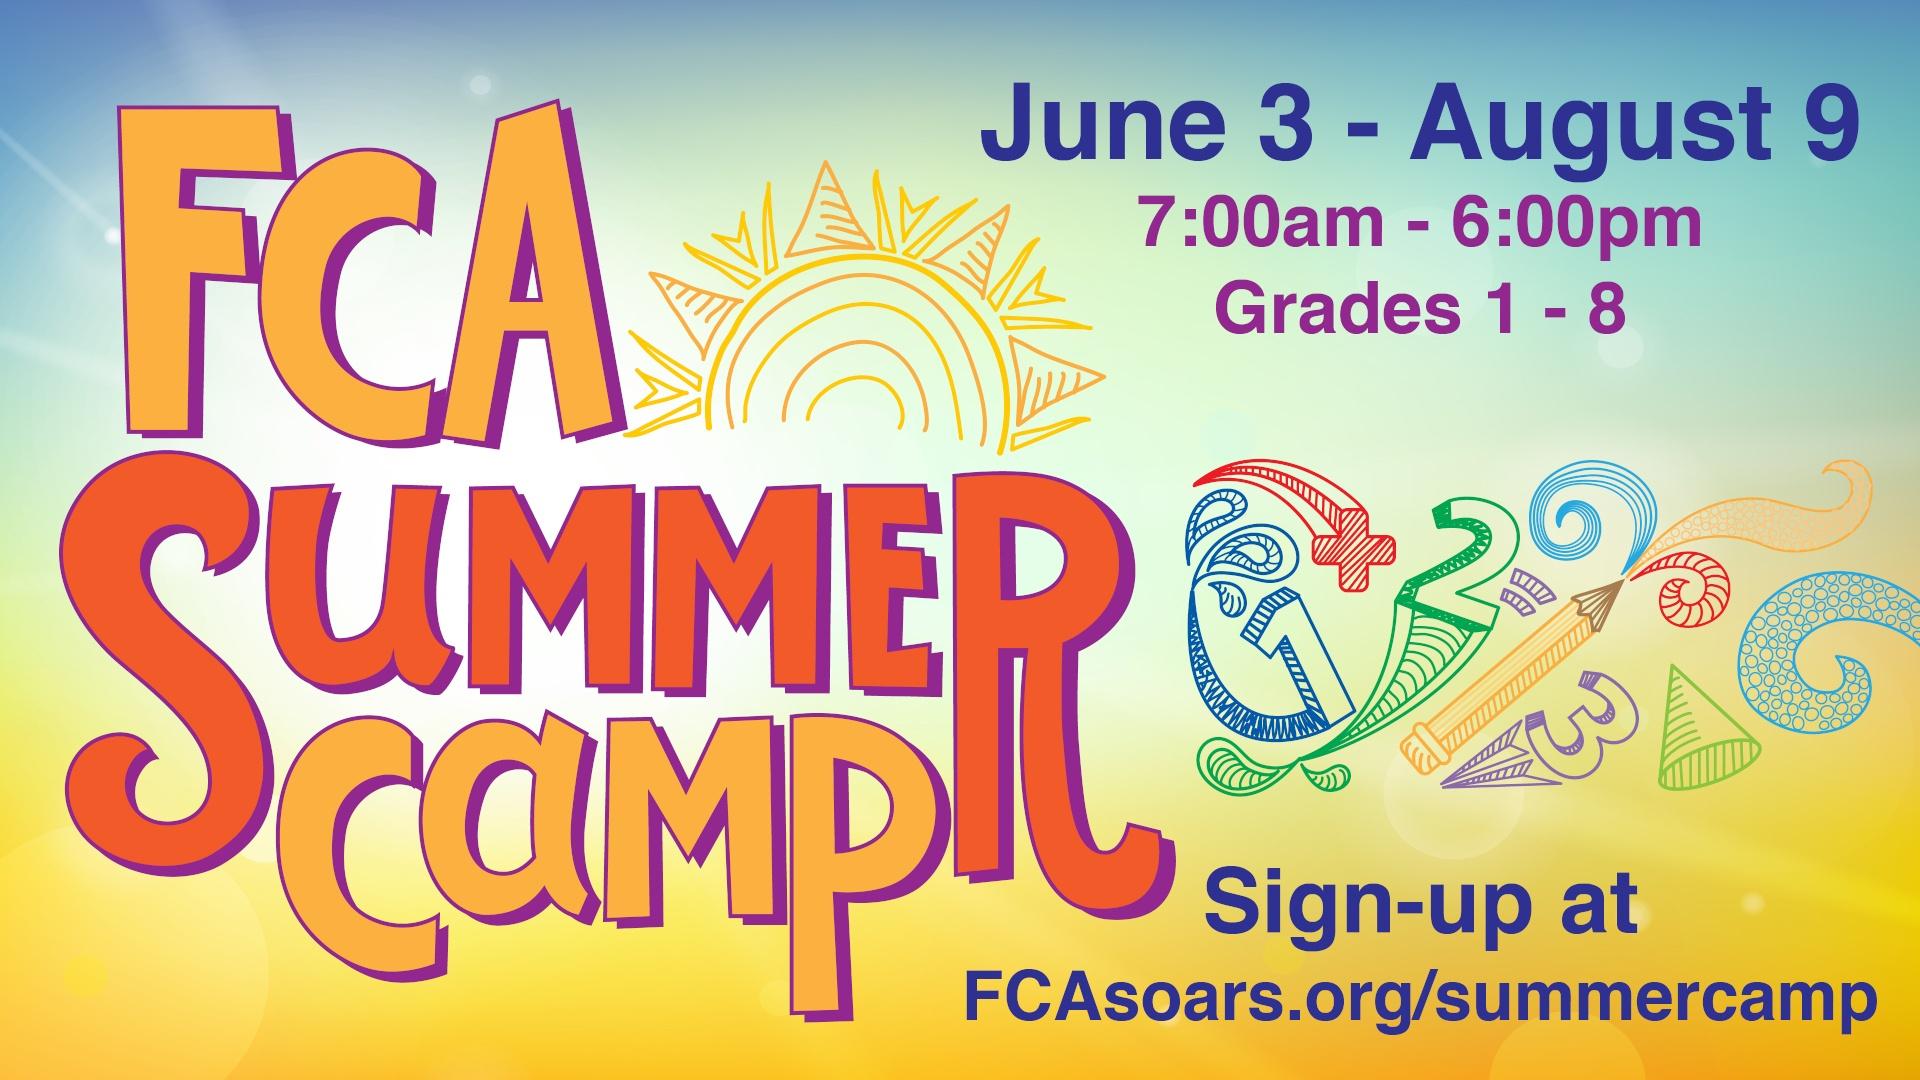 FCA Summer Camp